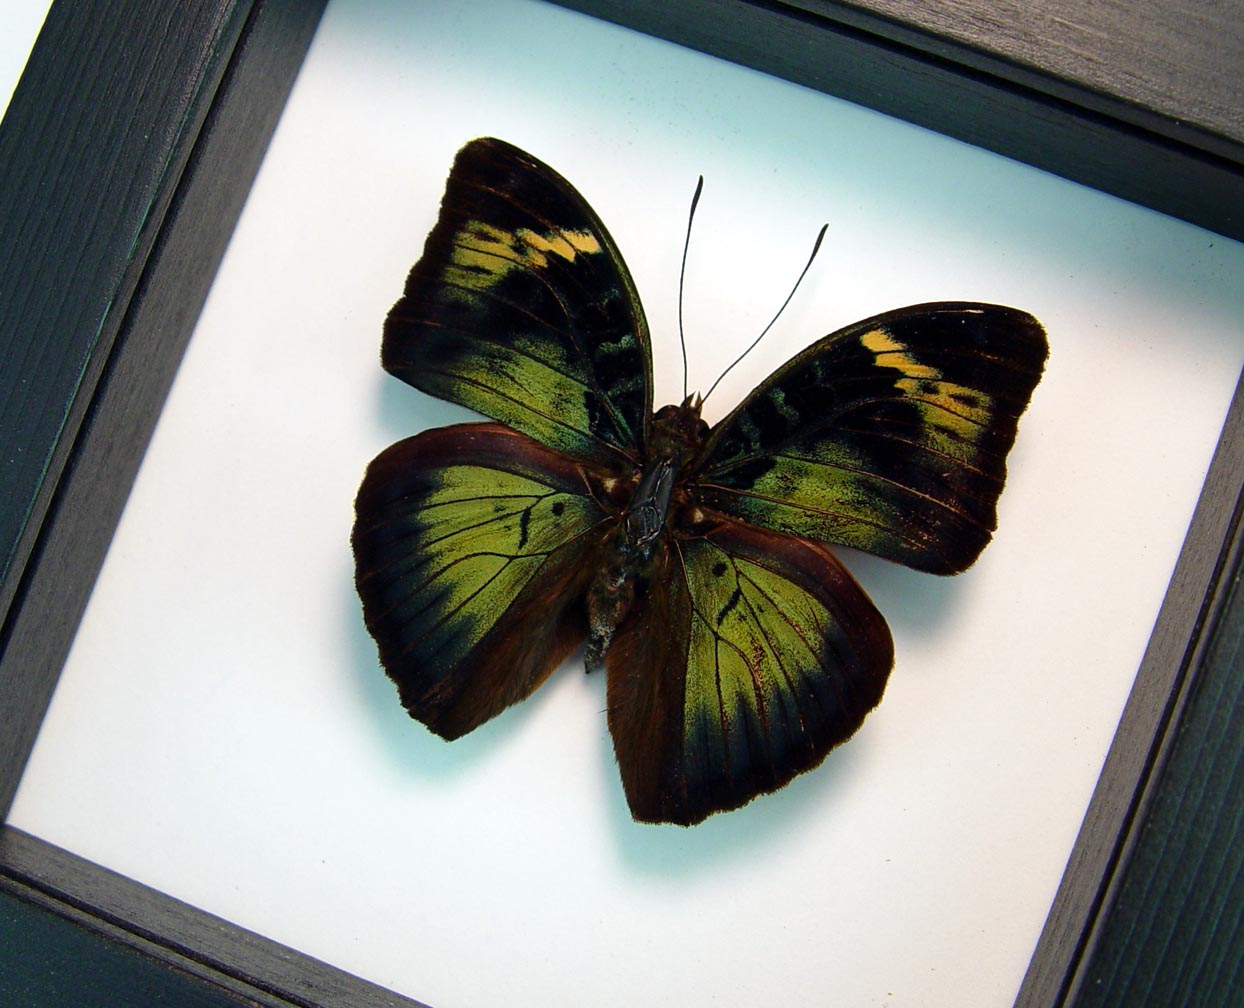 Bebearia sp Green Framed African Butterfly Classic Black Display ooak